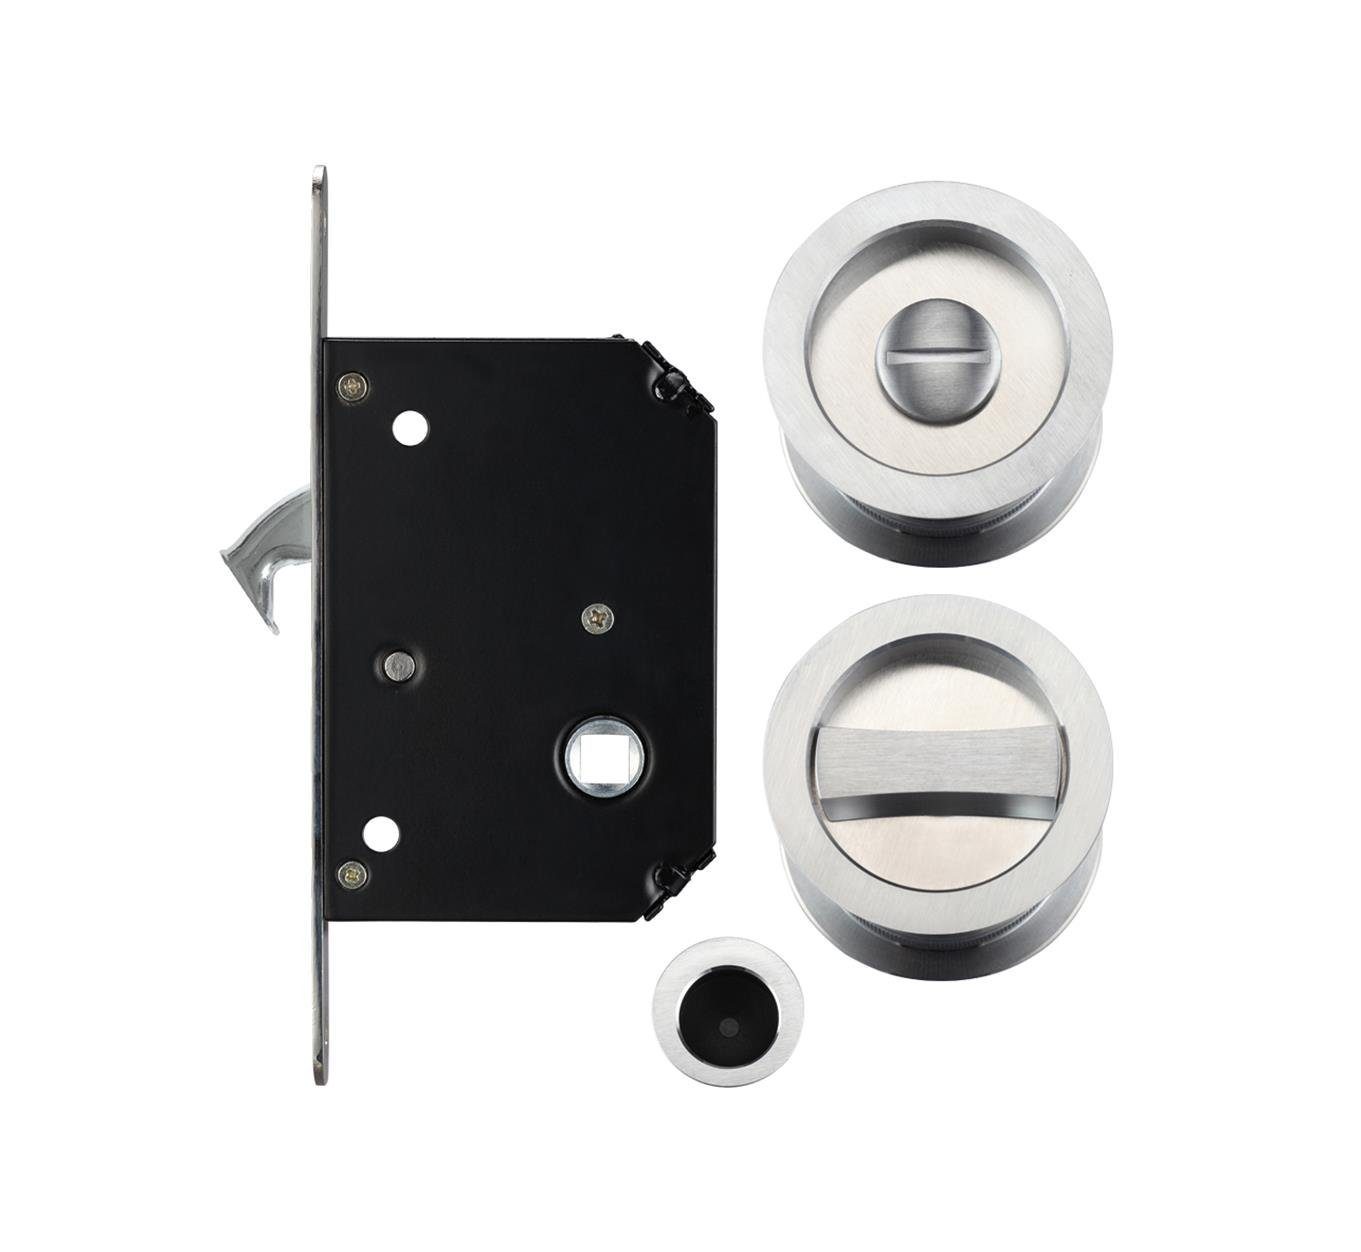 Pleasing Supreme Entrance Privacy Sliding Pocket Door Lock Set With Download Free Architecture Designs Embacsunscenecom